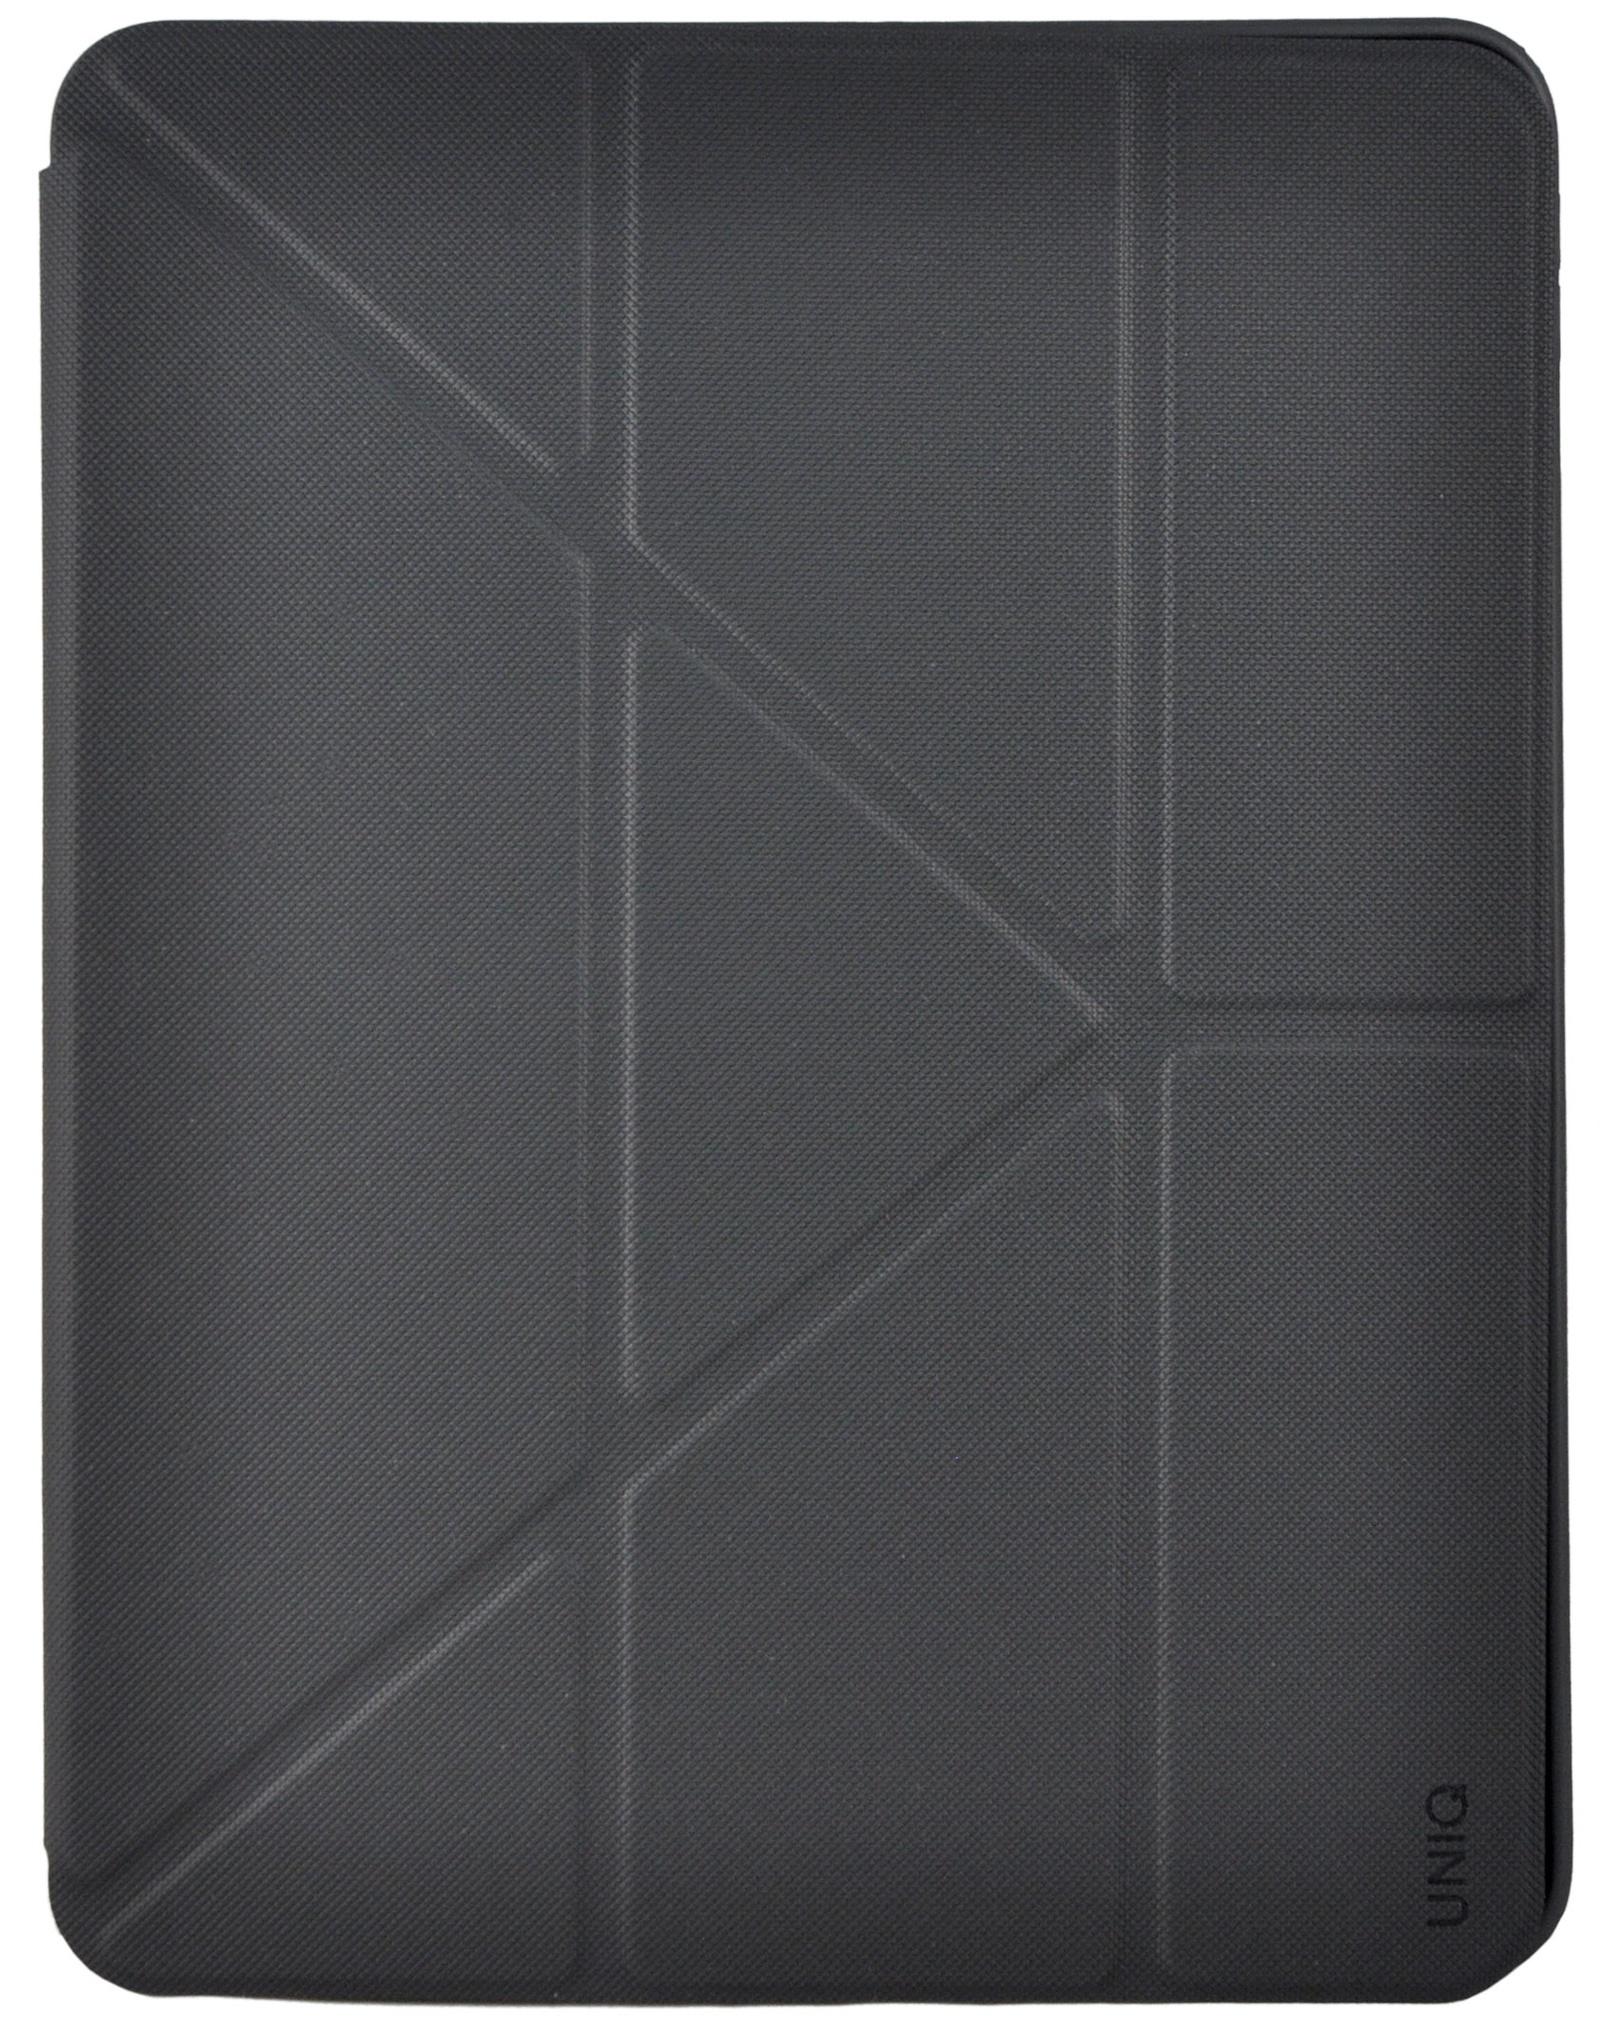 Фото - Чехол Uniq для iPad Pro 12.9 Transforma Rigor с отсеком для стилуса Black чехол книжка uniq tri fold rigor для apple ipad 9 7 2018 красный